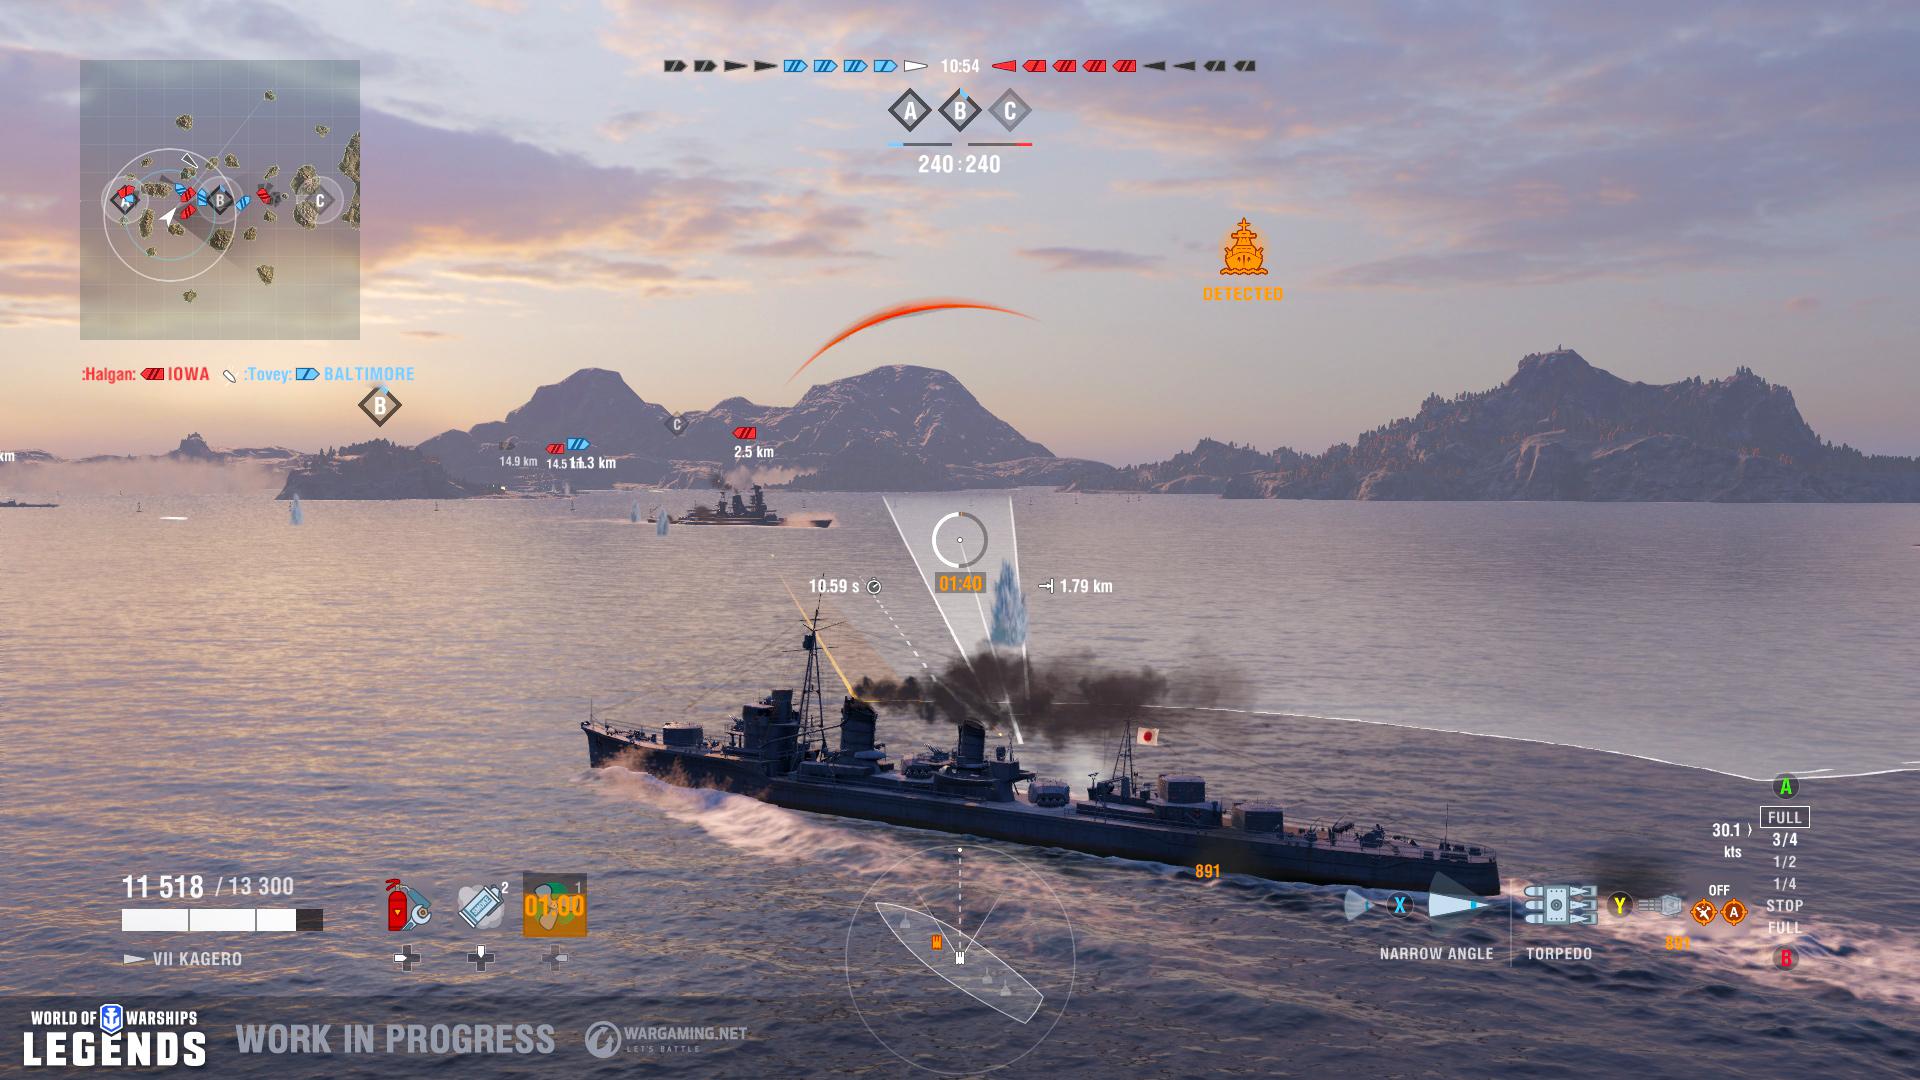 World of Warships: Legends Screenshots Image #16443 - XboxOne-HQ.COM